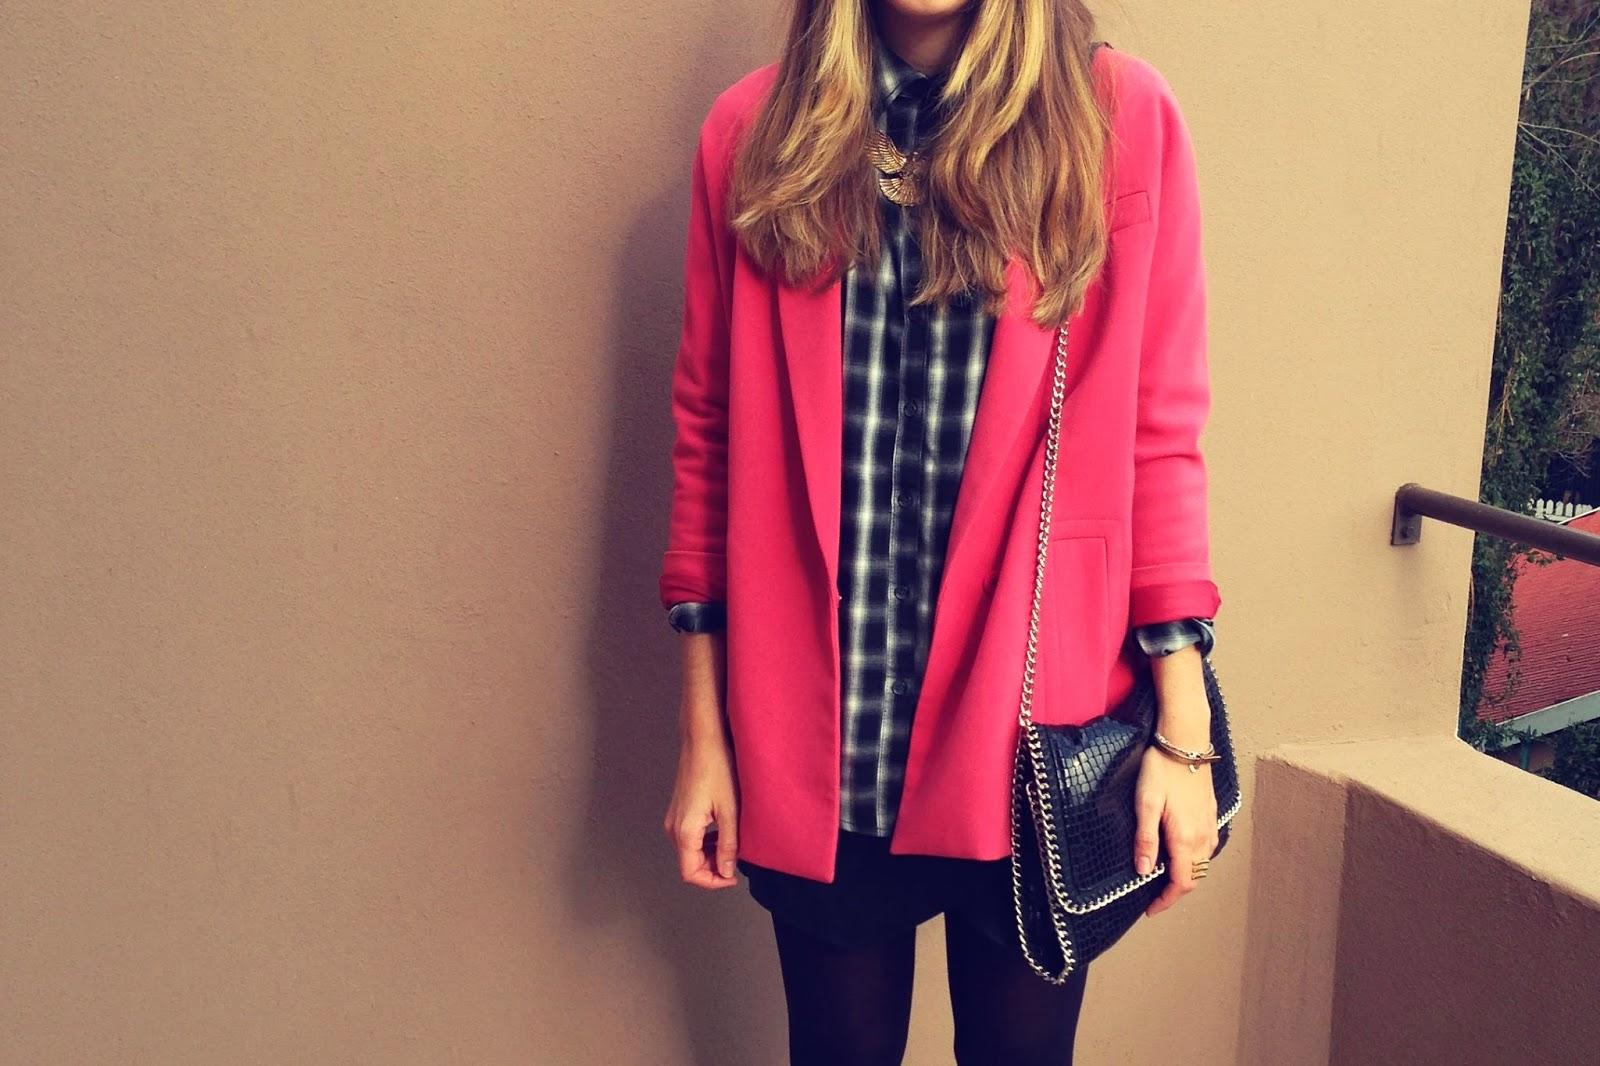 pink oversized blazer inside my closet